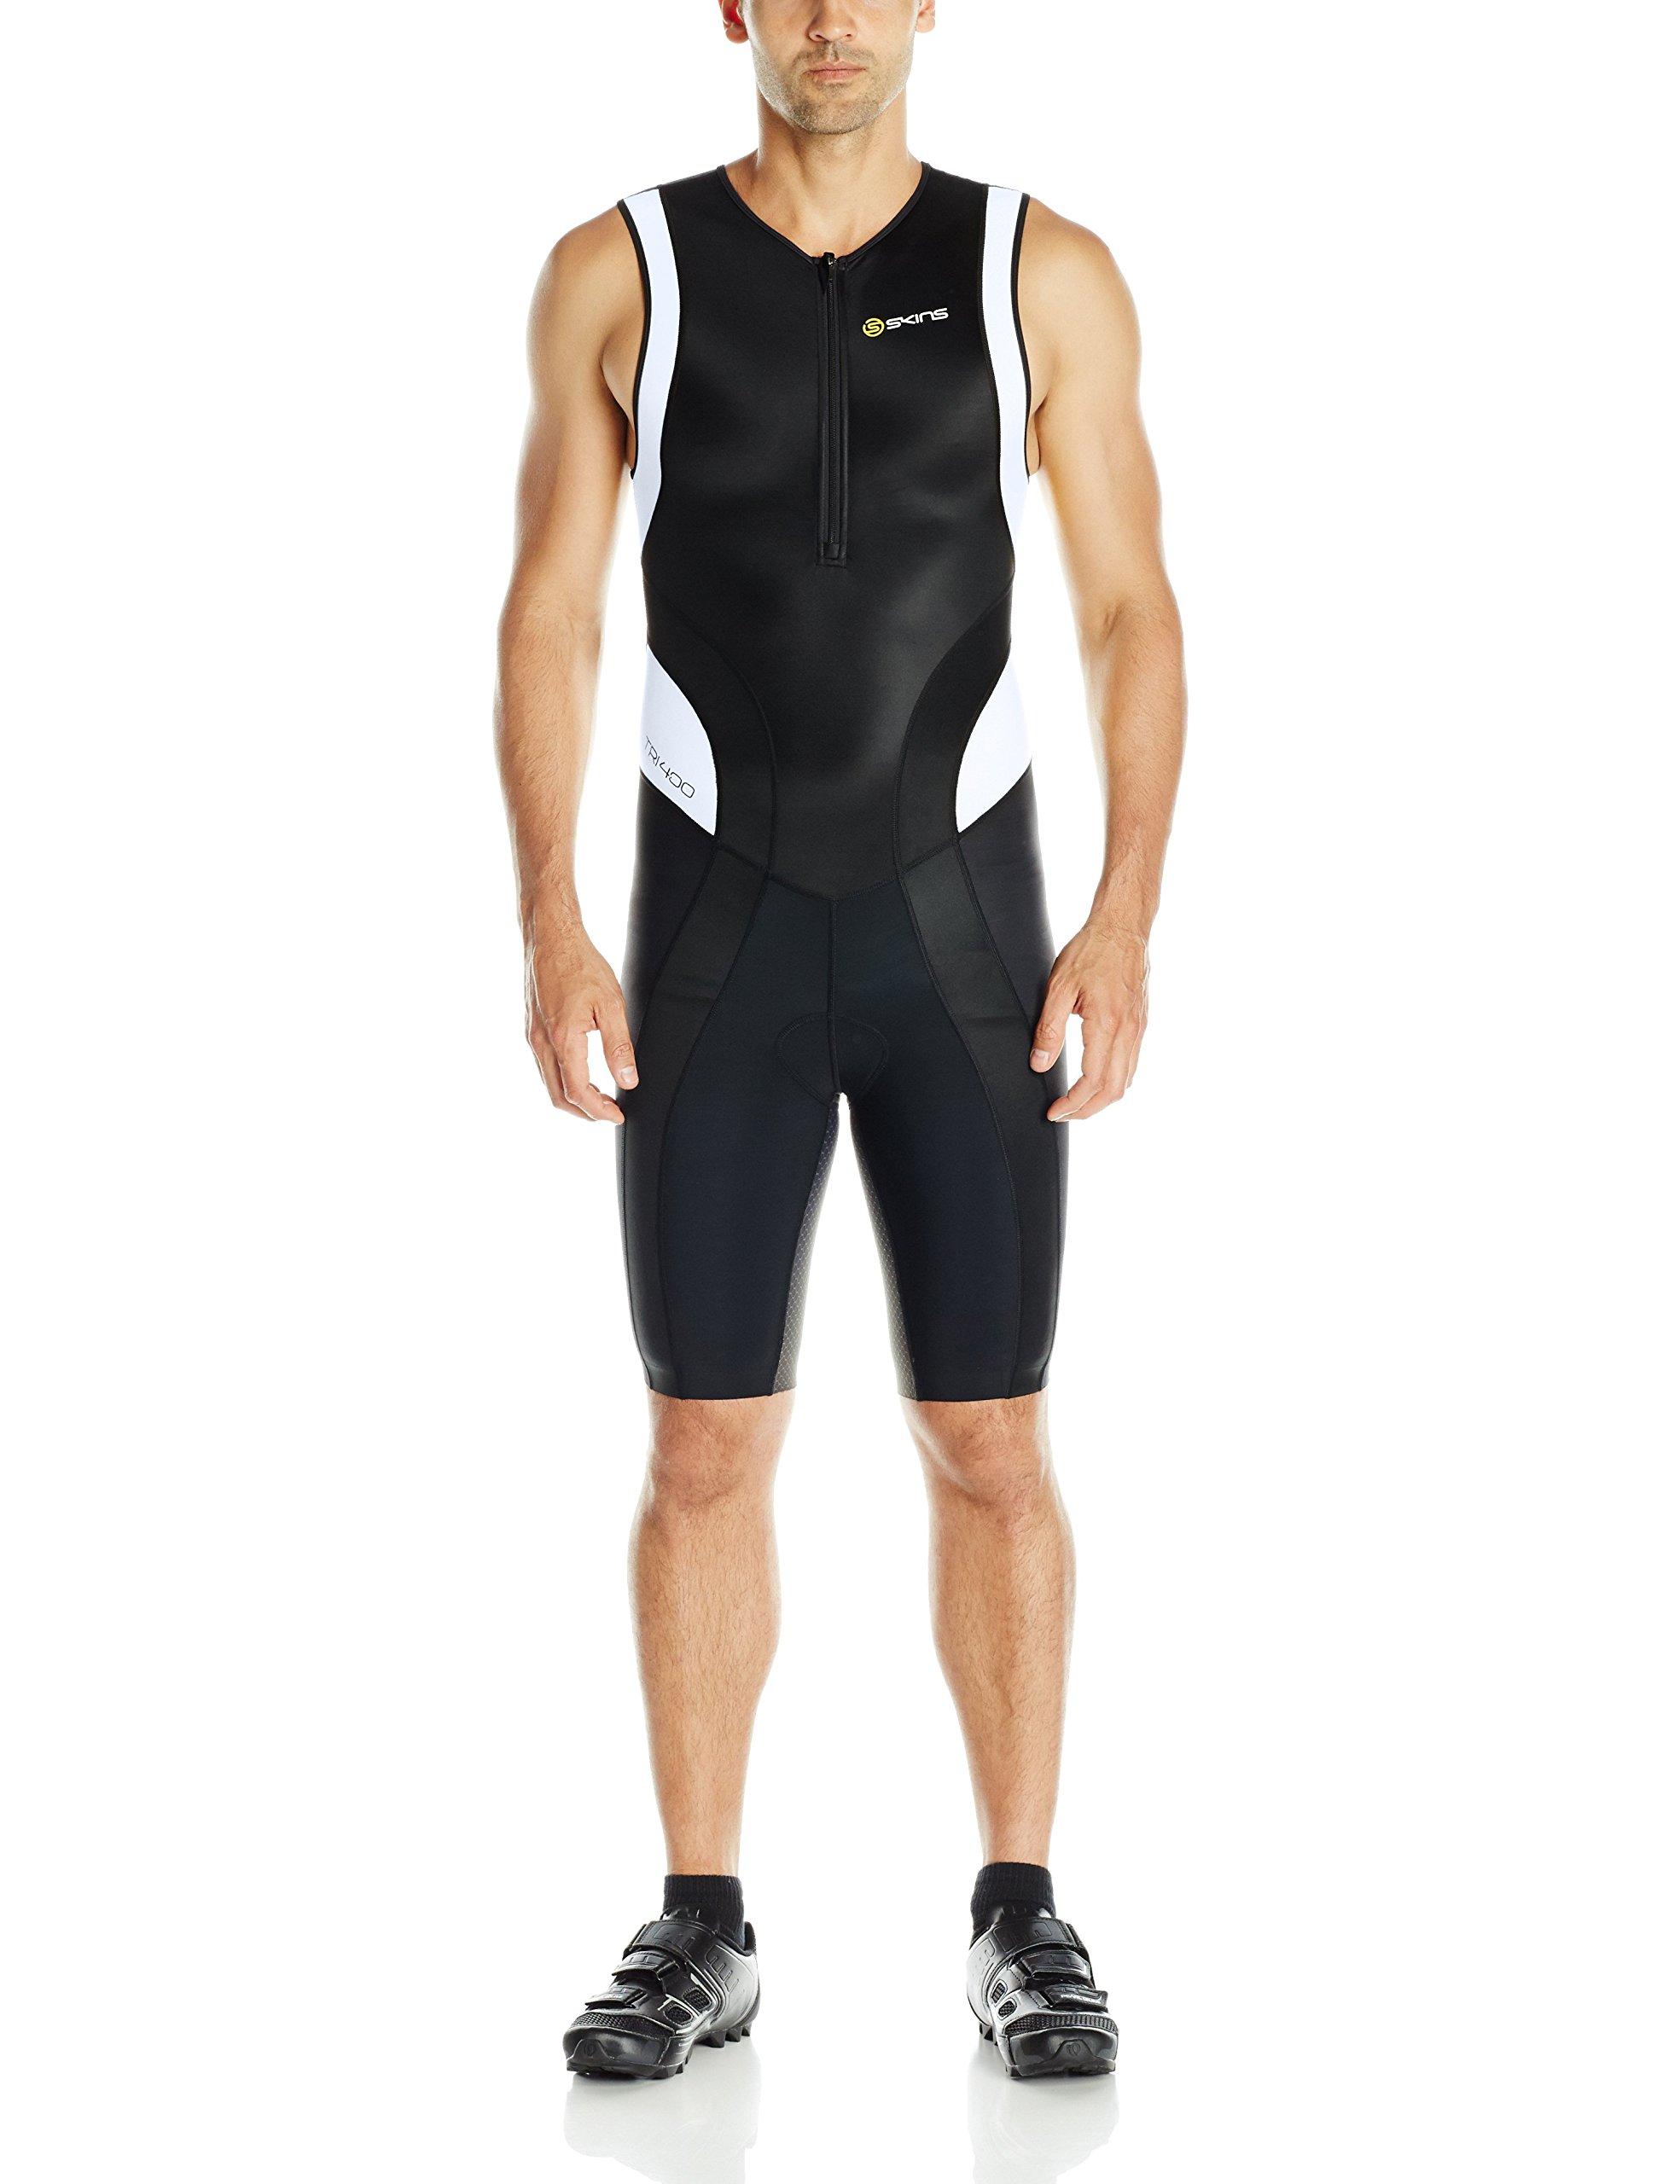 Skins Herren Tri 400 Skinsuit Wfront Zip,Black/White, XS, ZT99360329055XS